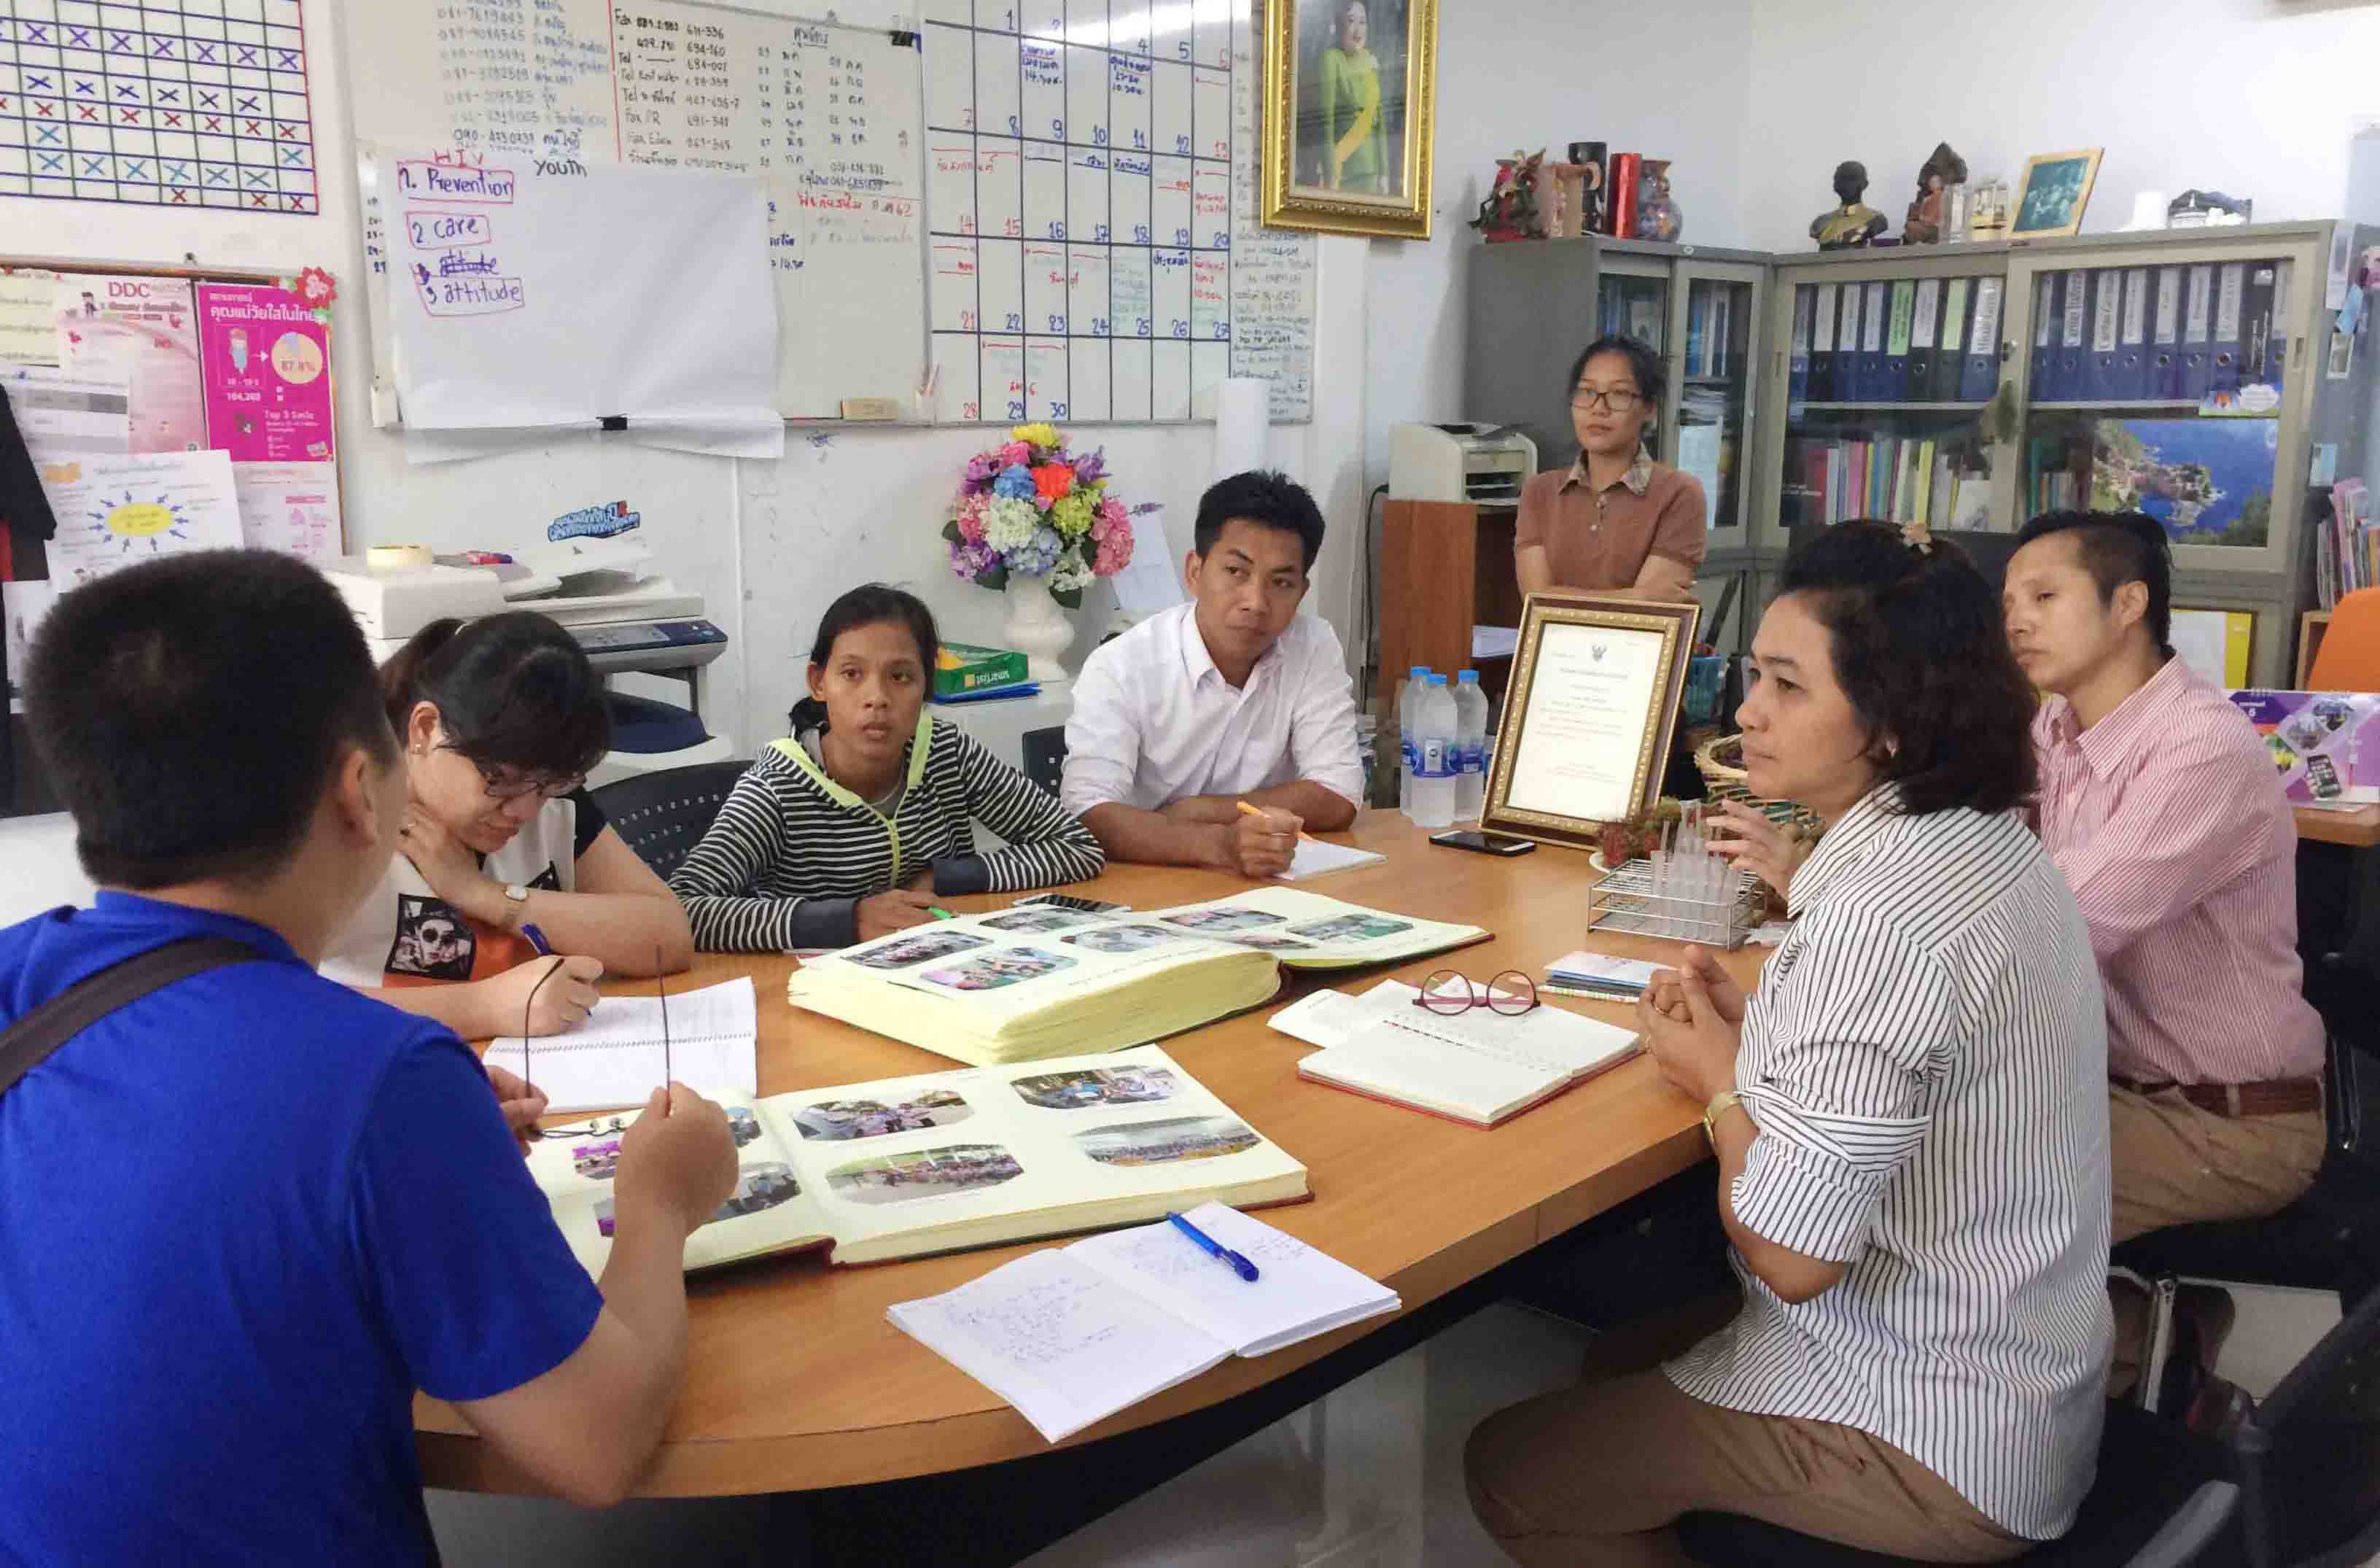 Ban HIV/AIDS Caritas Phan Thiết: Trải nghiệm - học hỏi